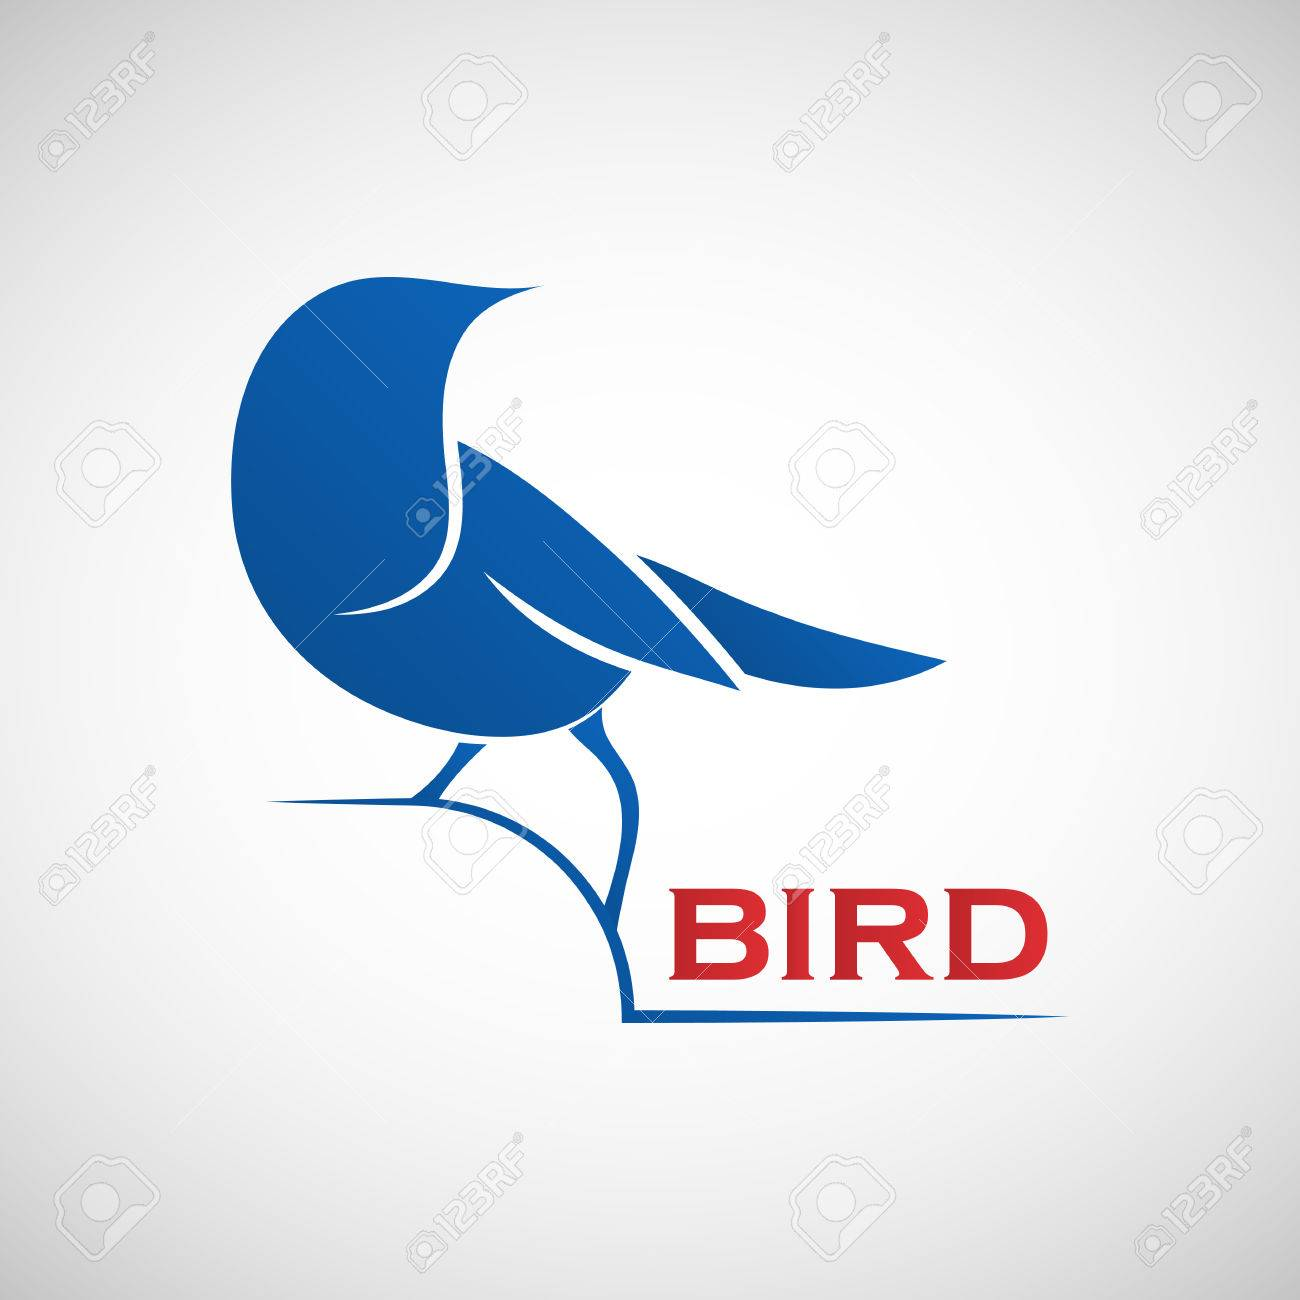 Abstract Blue Bird Logo Template Vector Illustration Of Sparrow